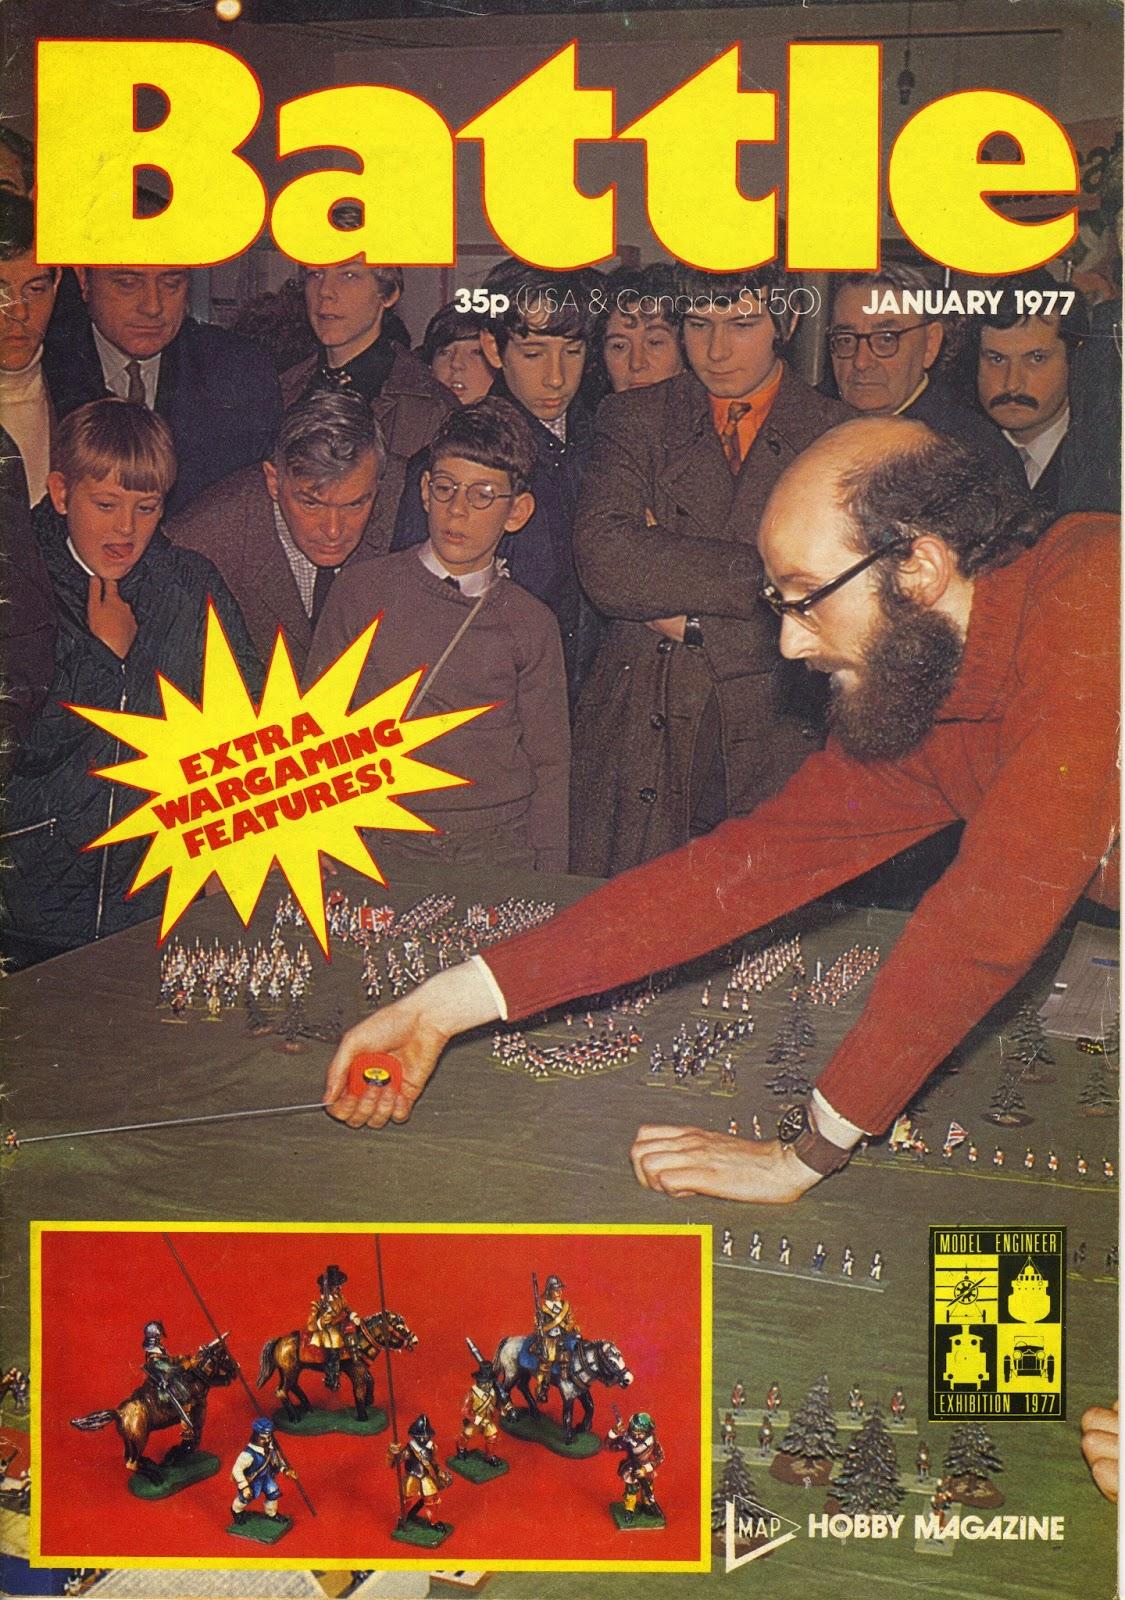 Wargamers années 1970 Scan-150421-0004